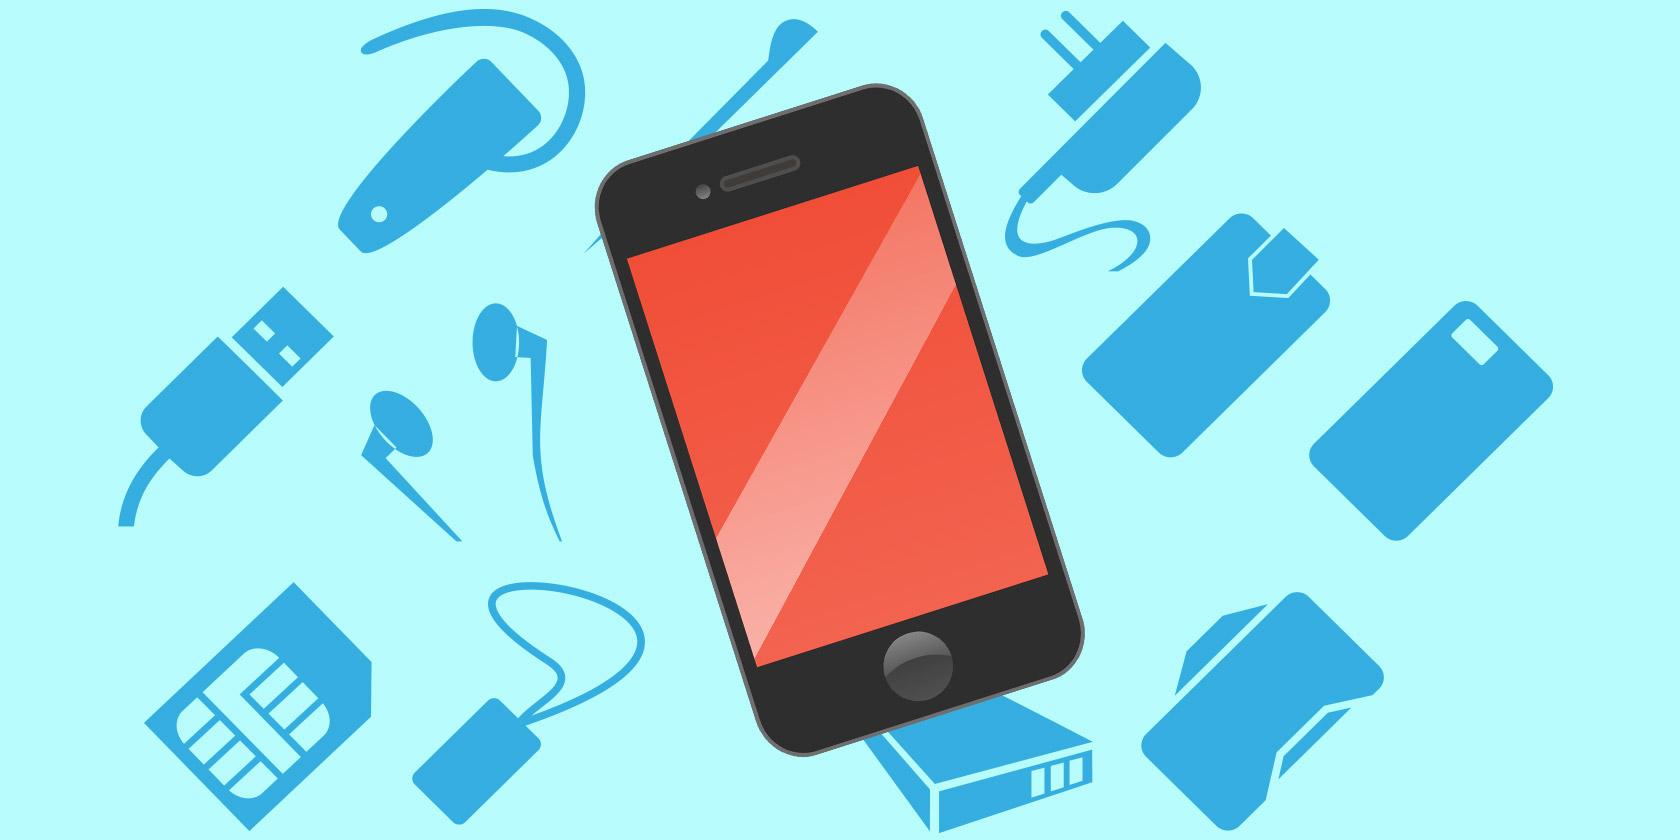 smartphone-accessories.jpg